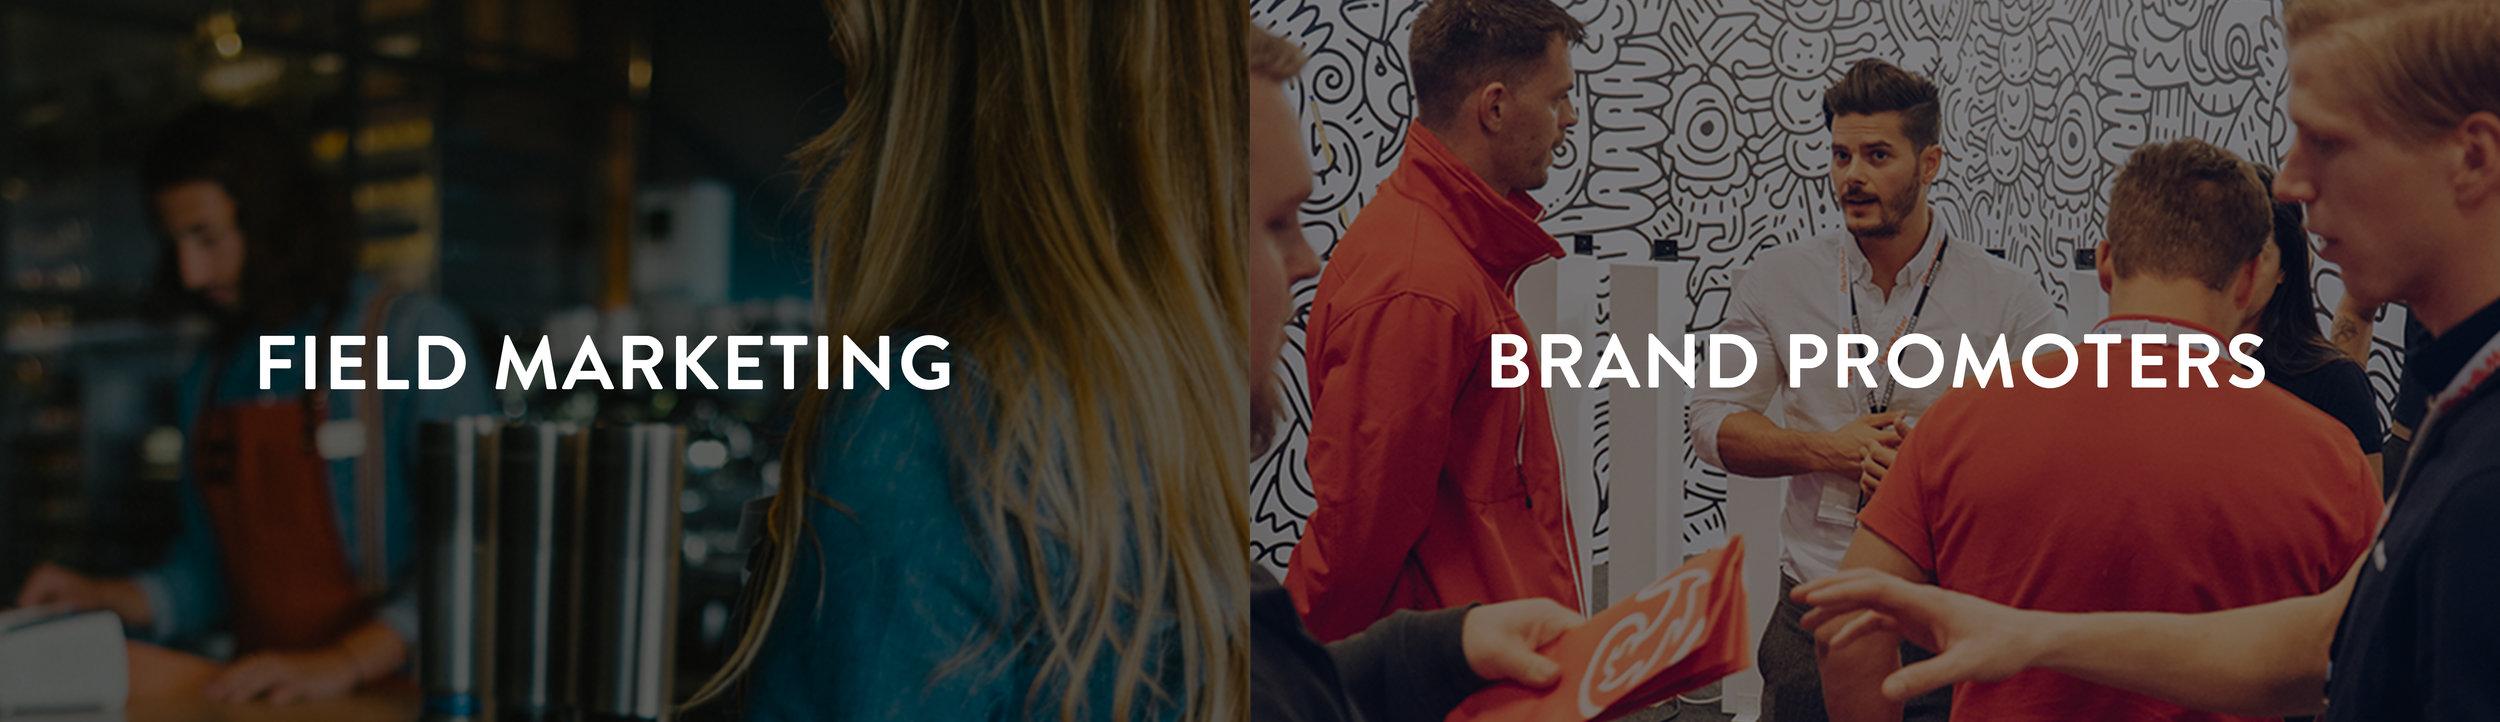 Retail Activations - Field marketing & Brand Promotion .jpg